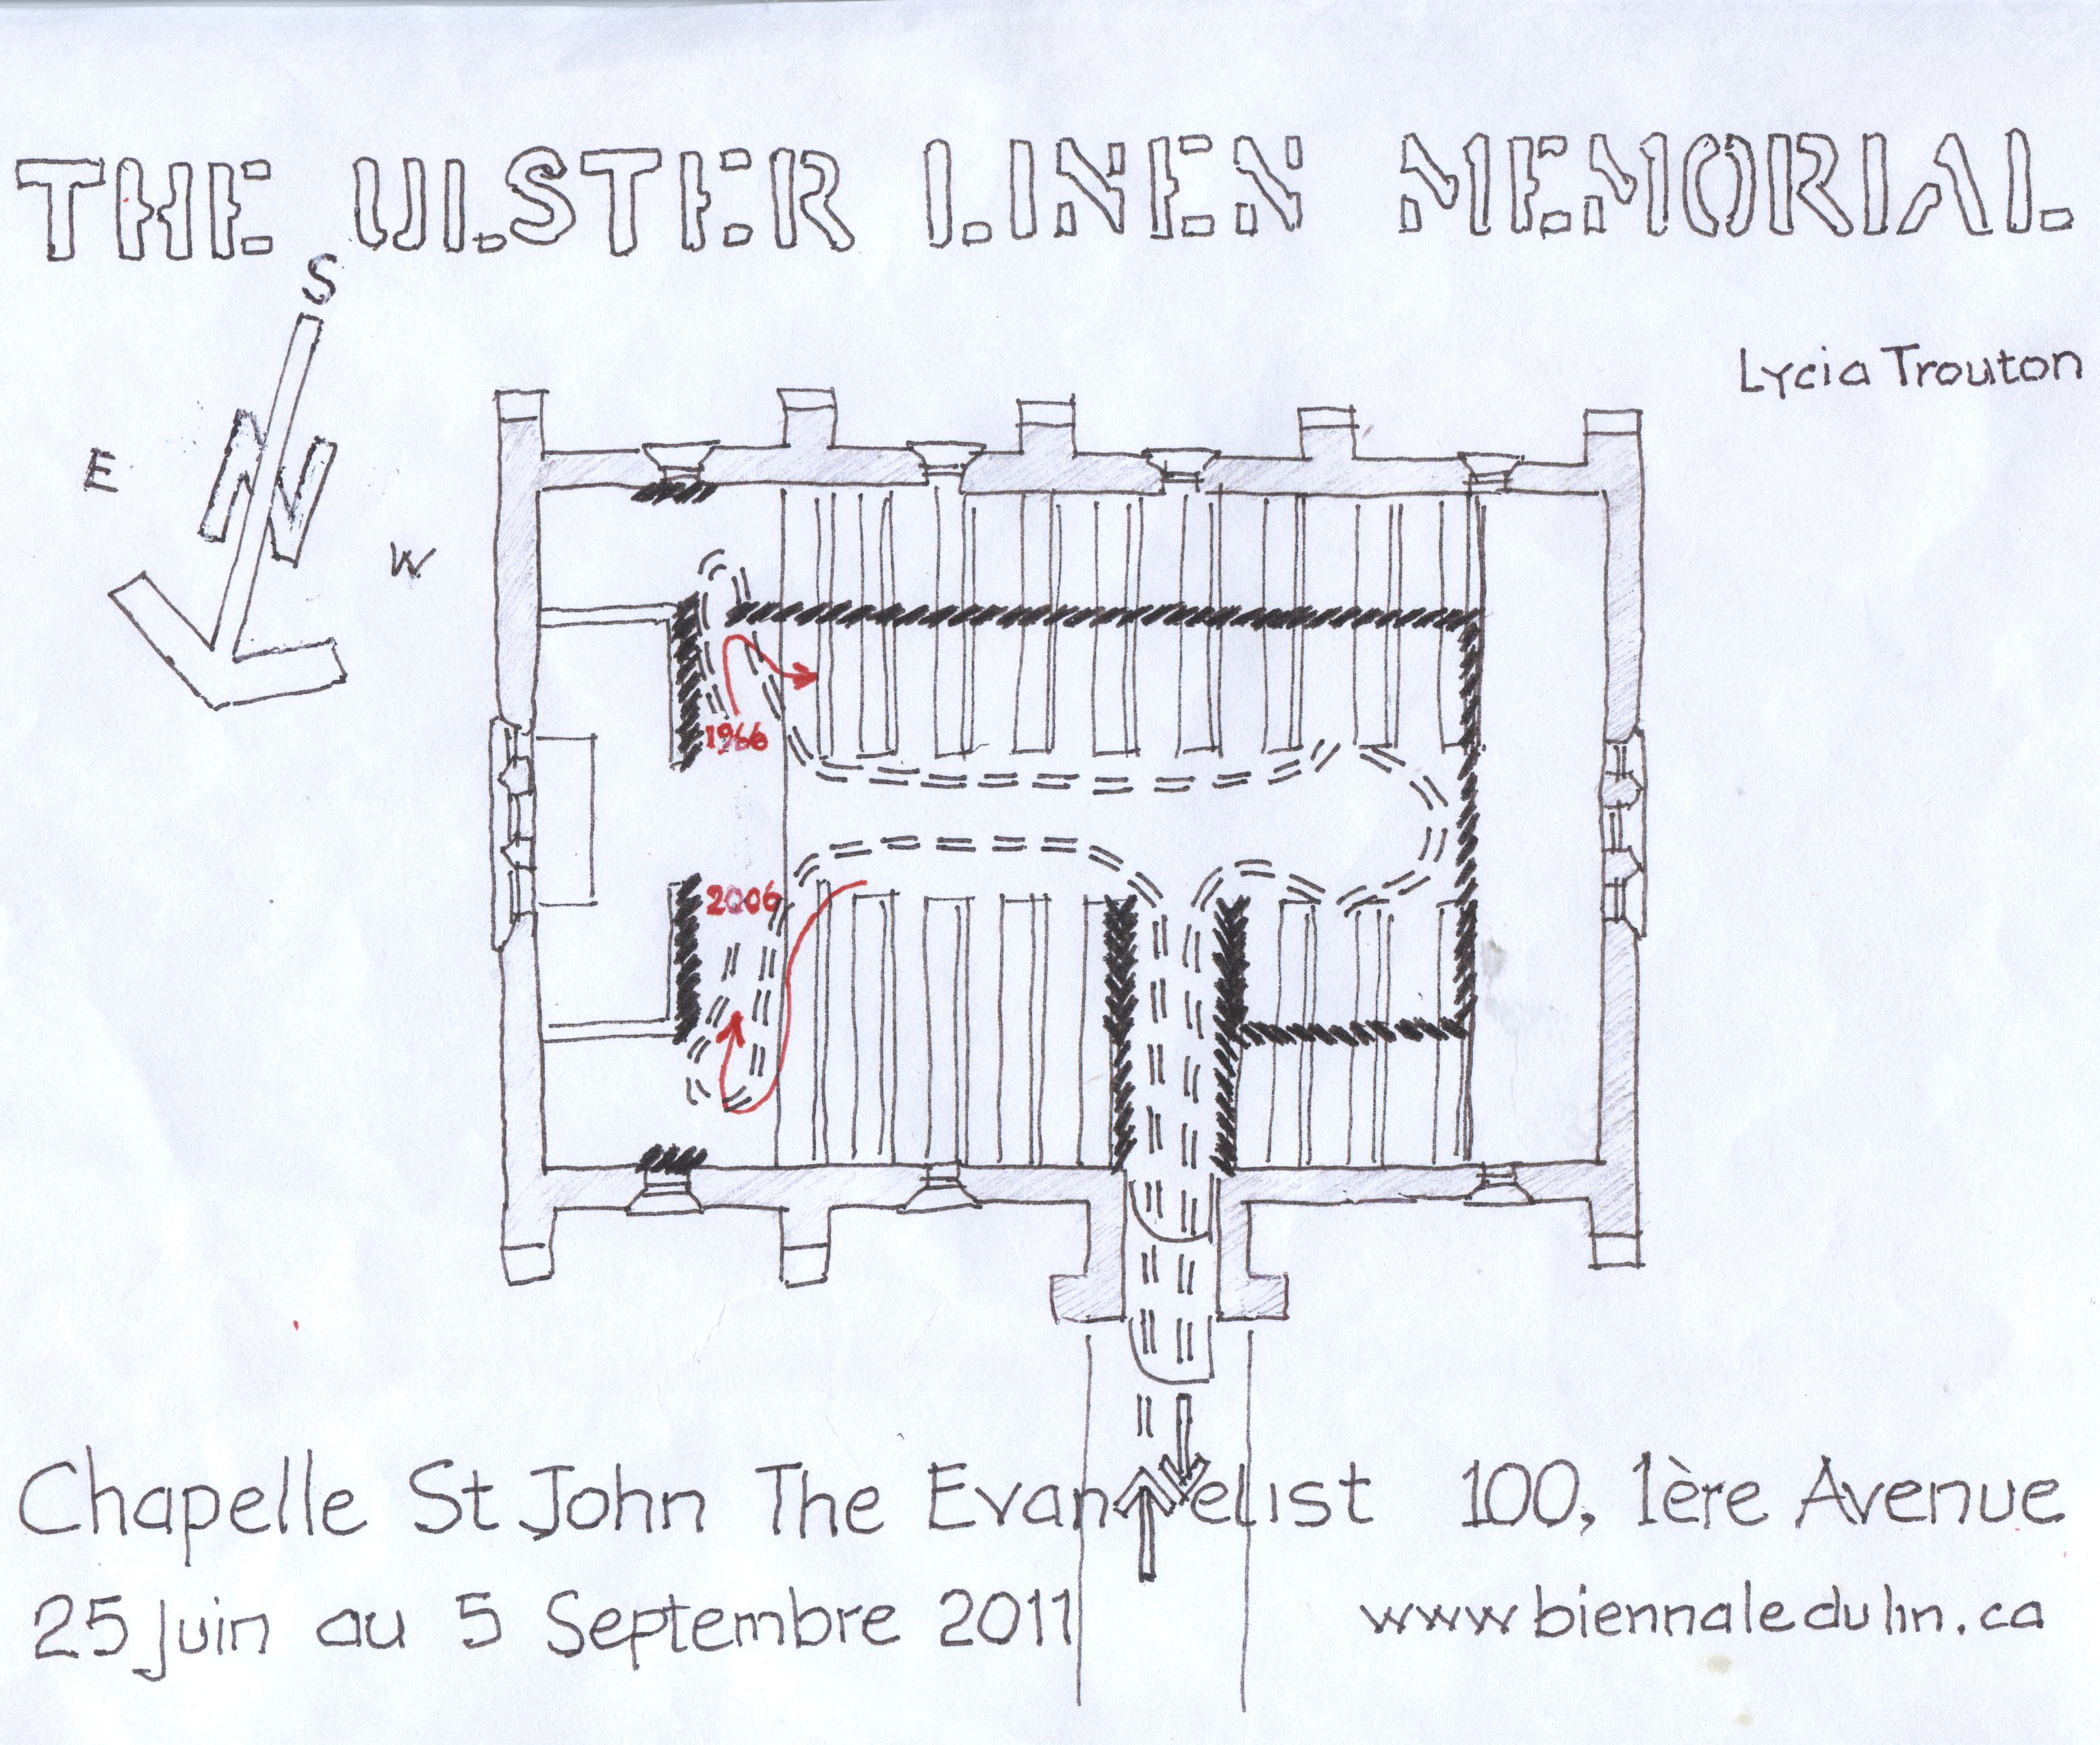 Irish Families And Globalization Conversations About Belonging 1980 B Tracker Wiring Diagram Schematic Plan Of Linen Memorial Installation Quebec 2011 Courtesy Robert